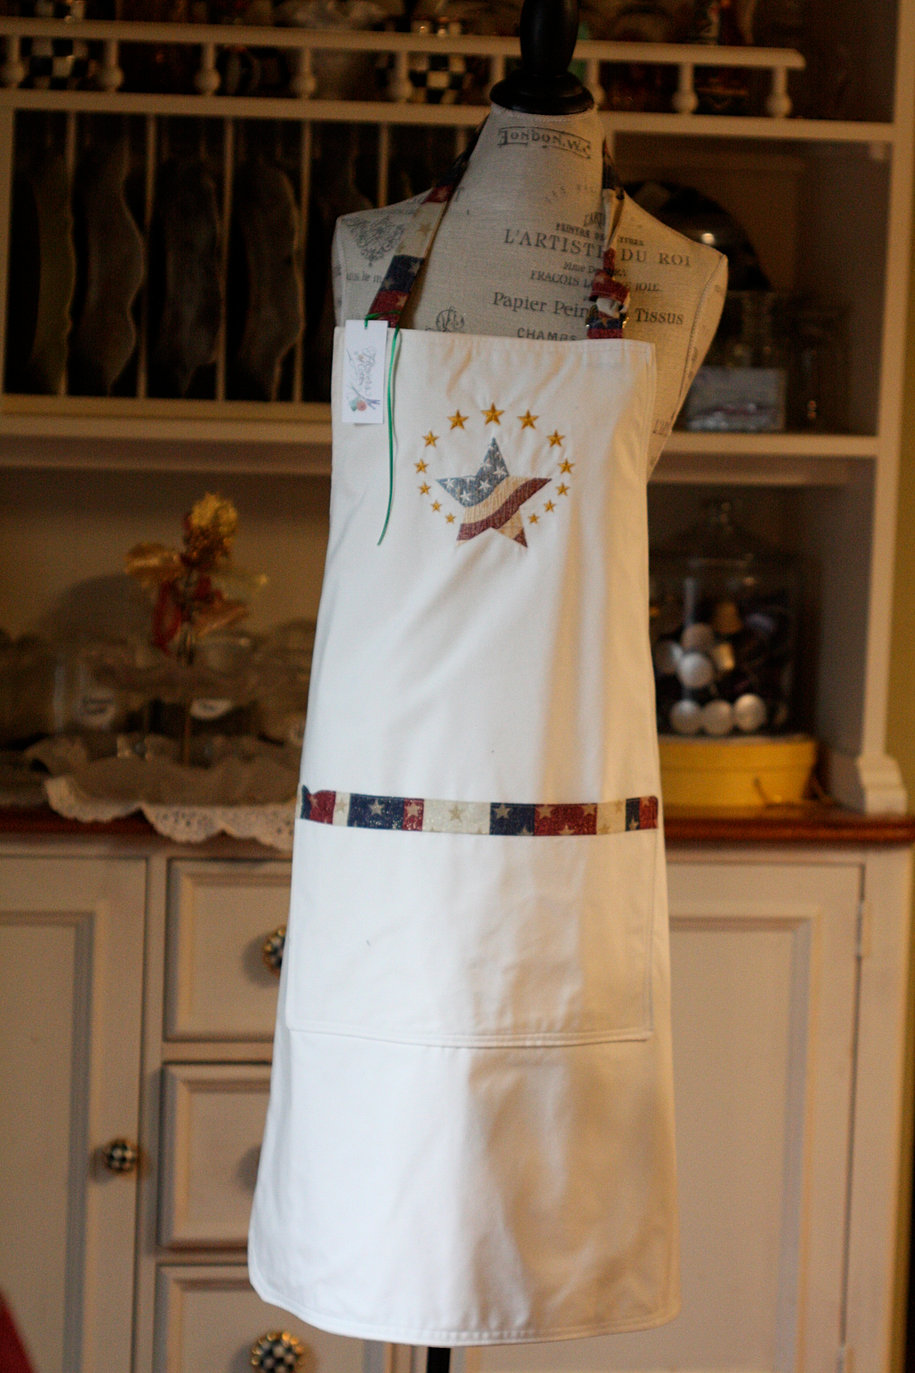 White apron brighton - Patriotic Star